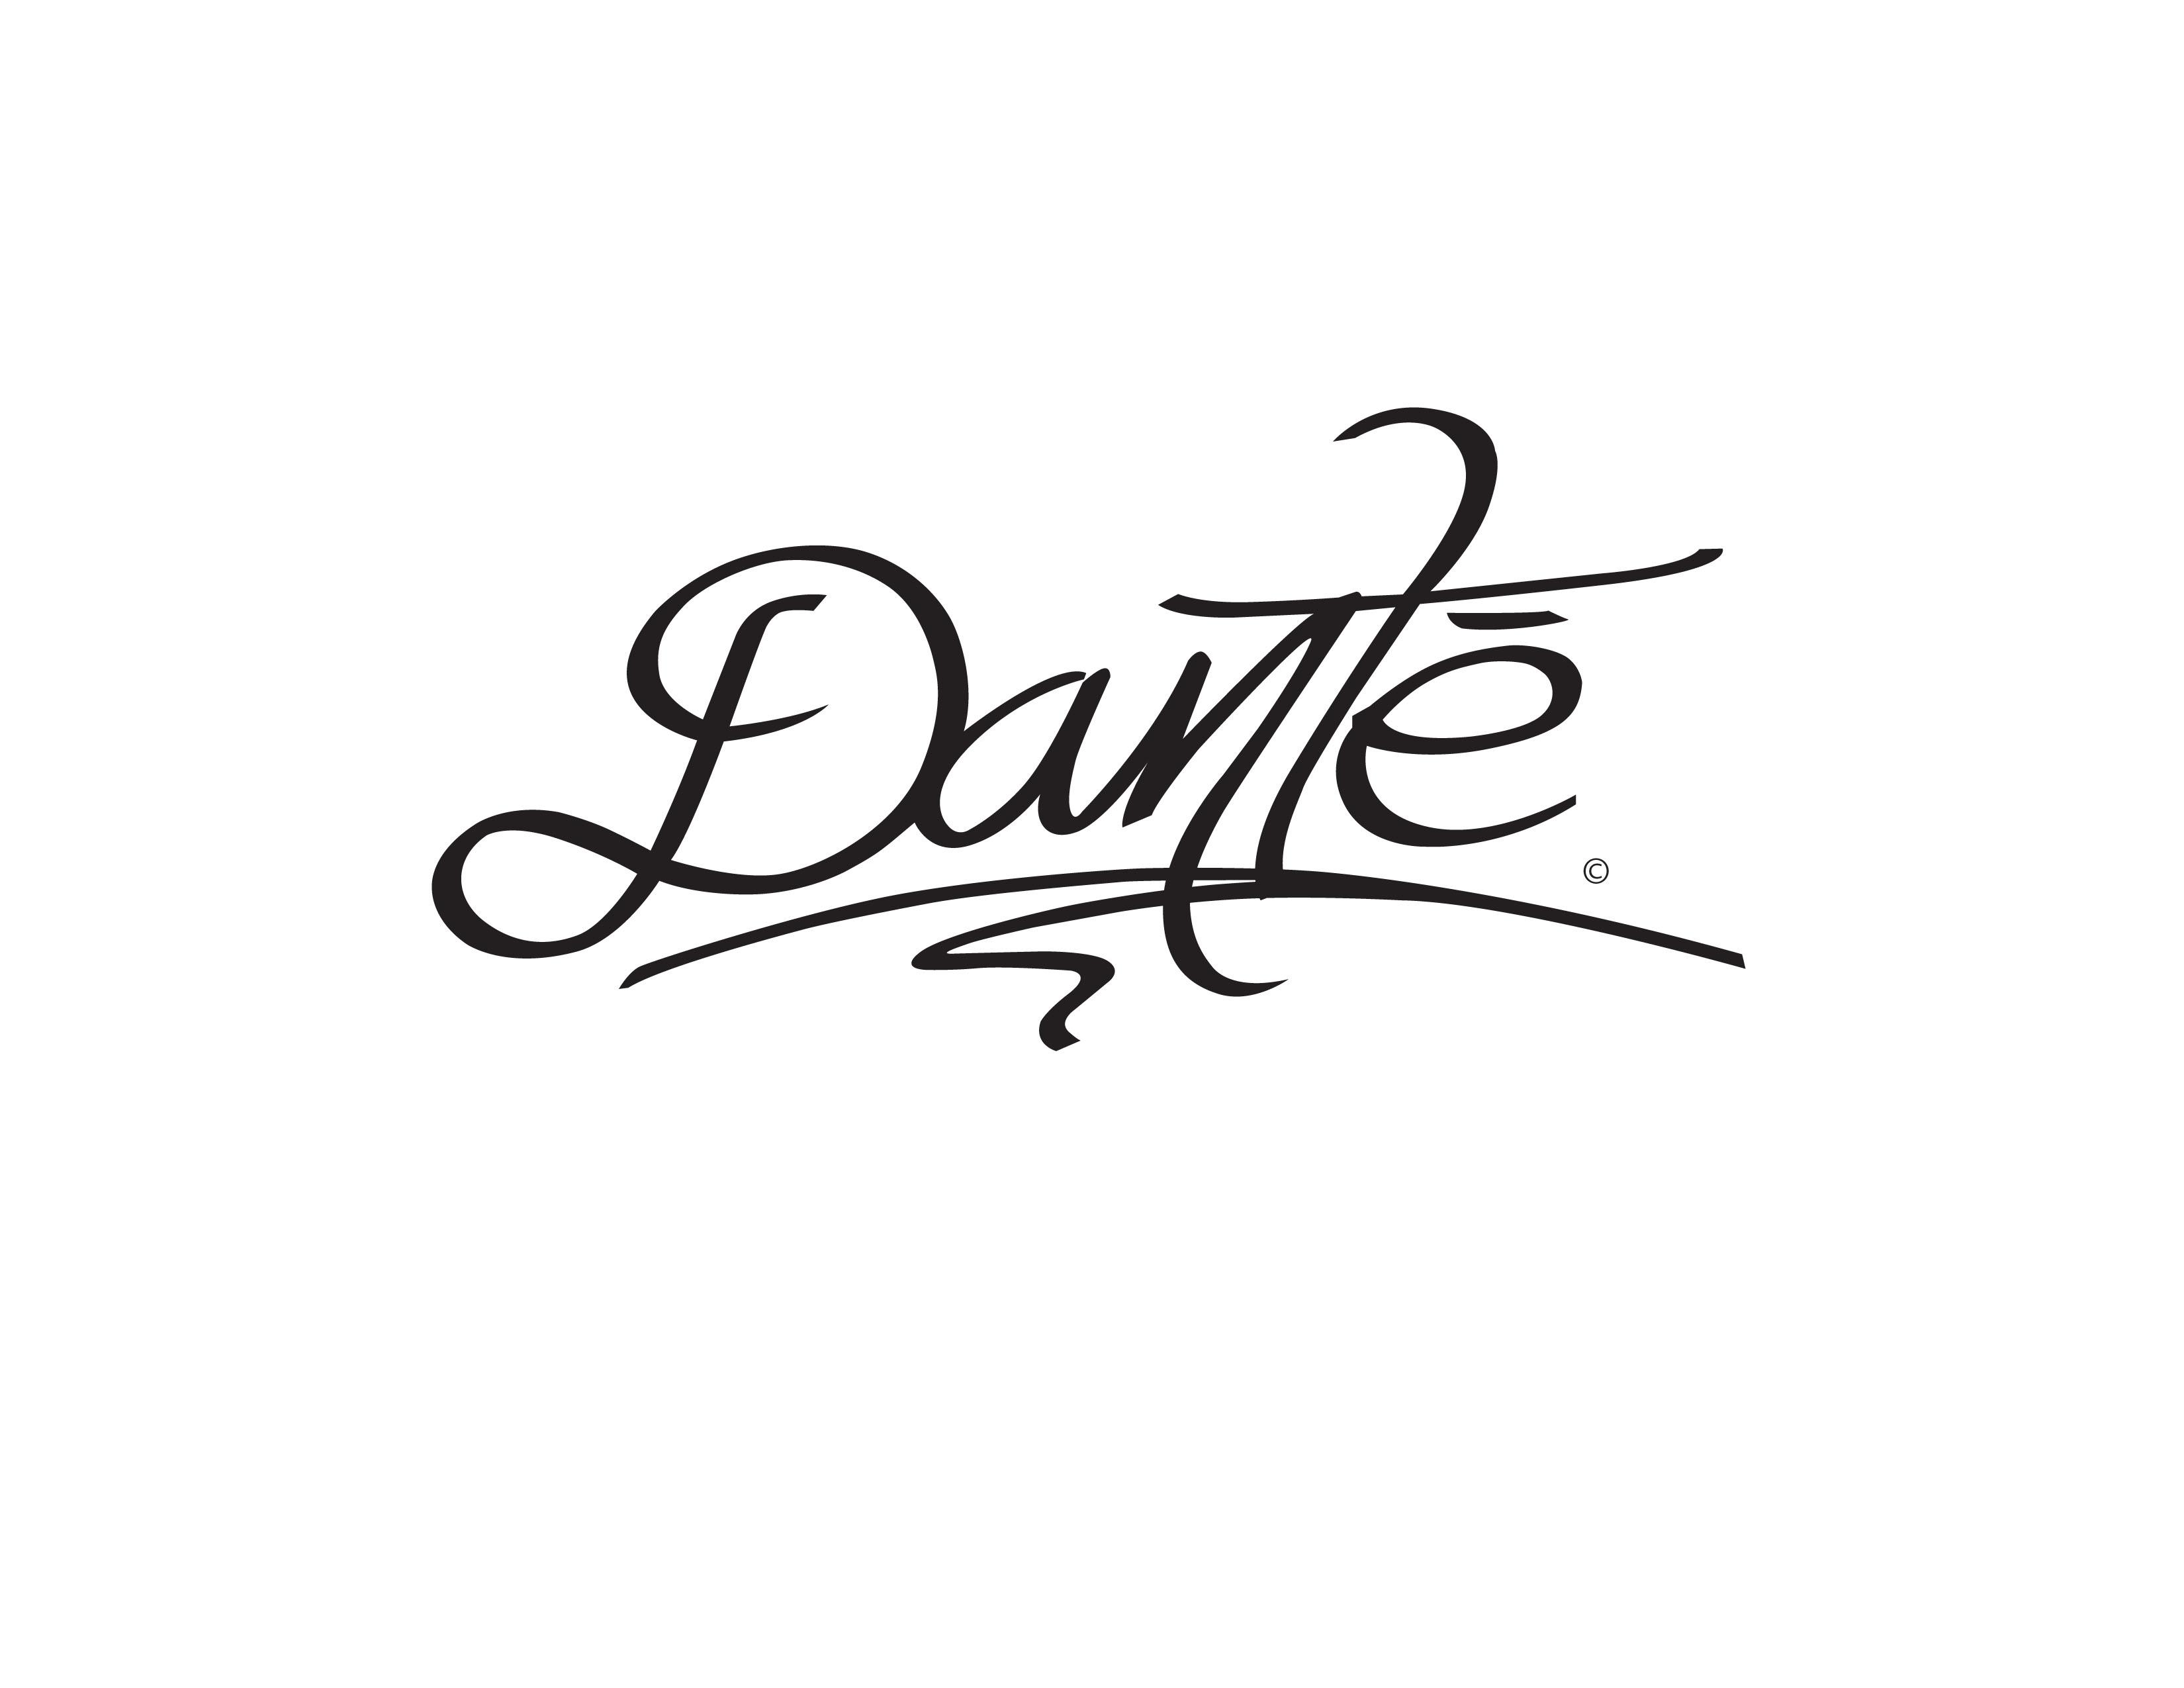 logo designs by dale b at coroflot com